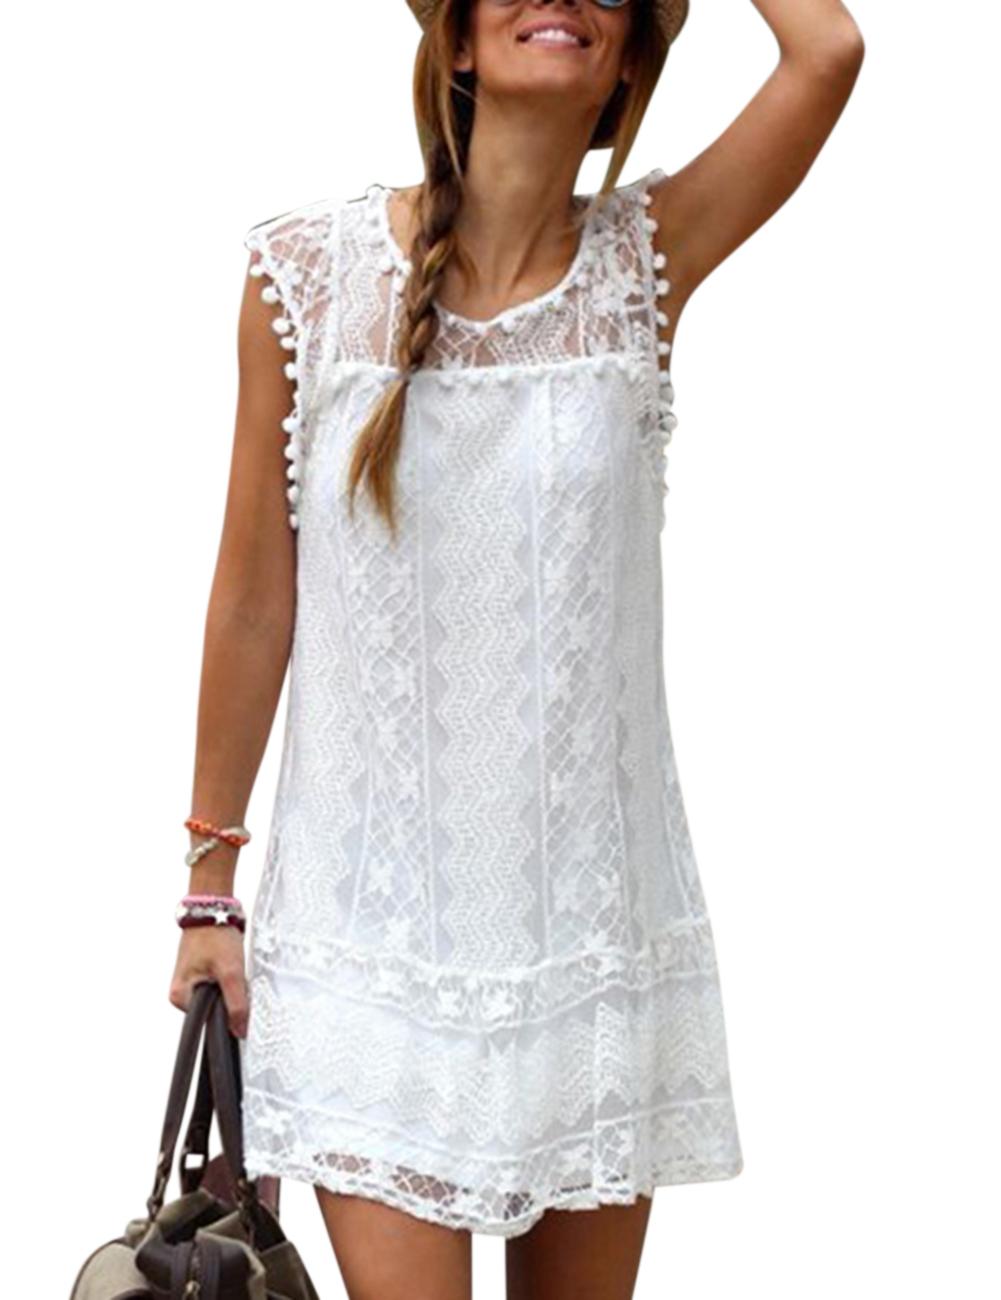 Damen Ärmellos Sommer Kleid Minikleid Strandkleid Cocktailkleid ...